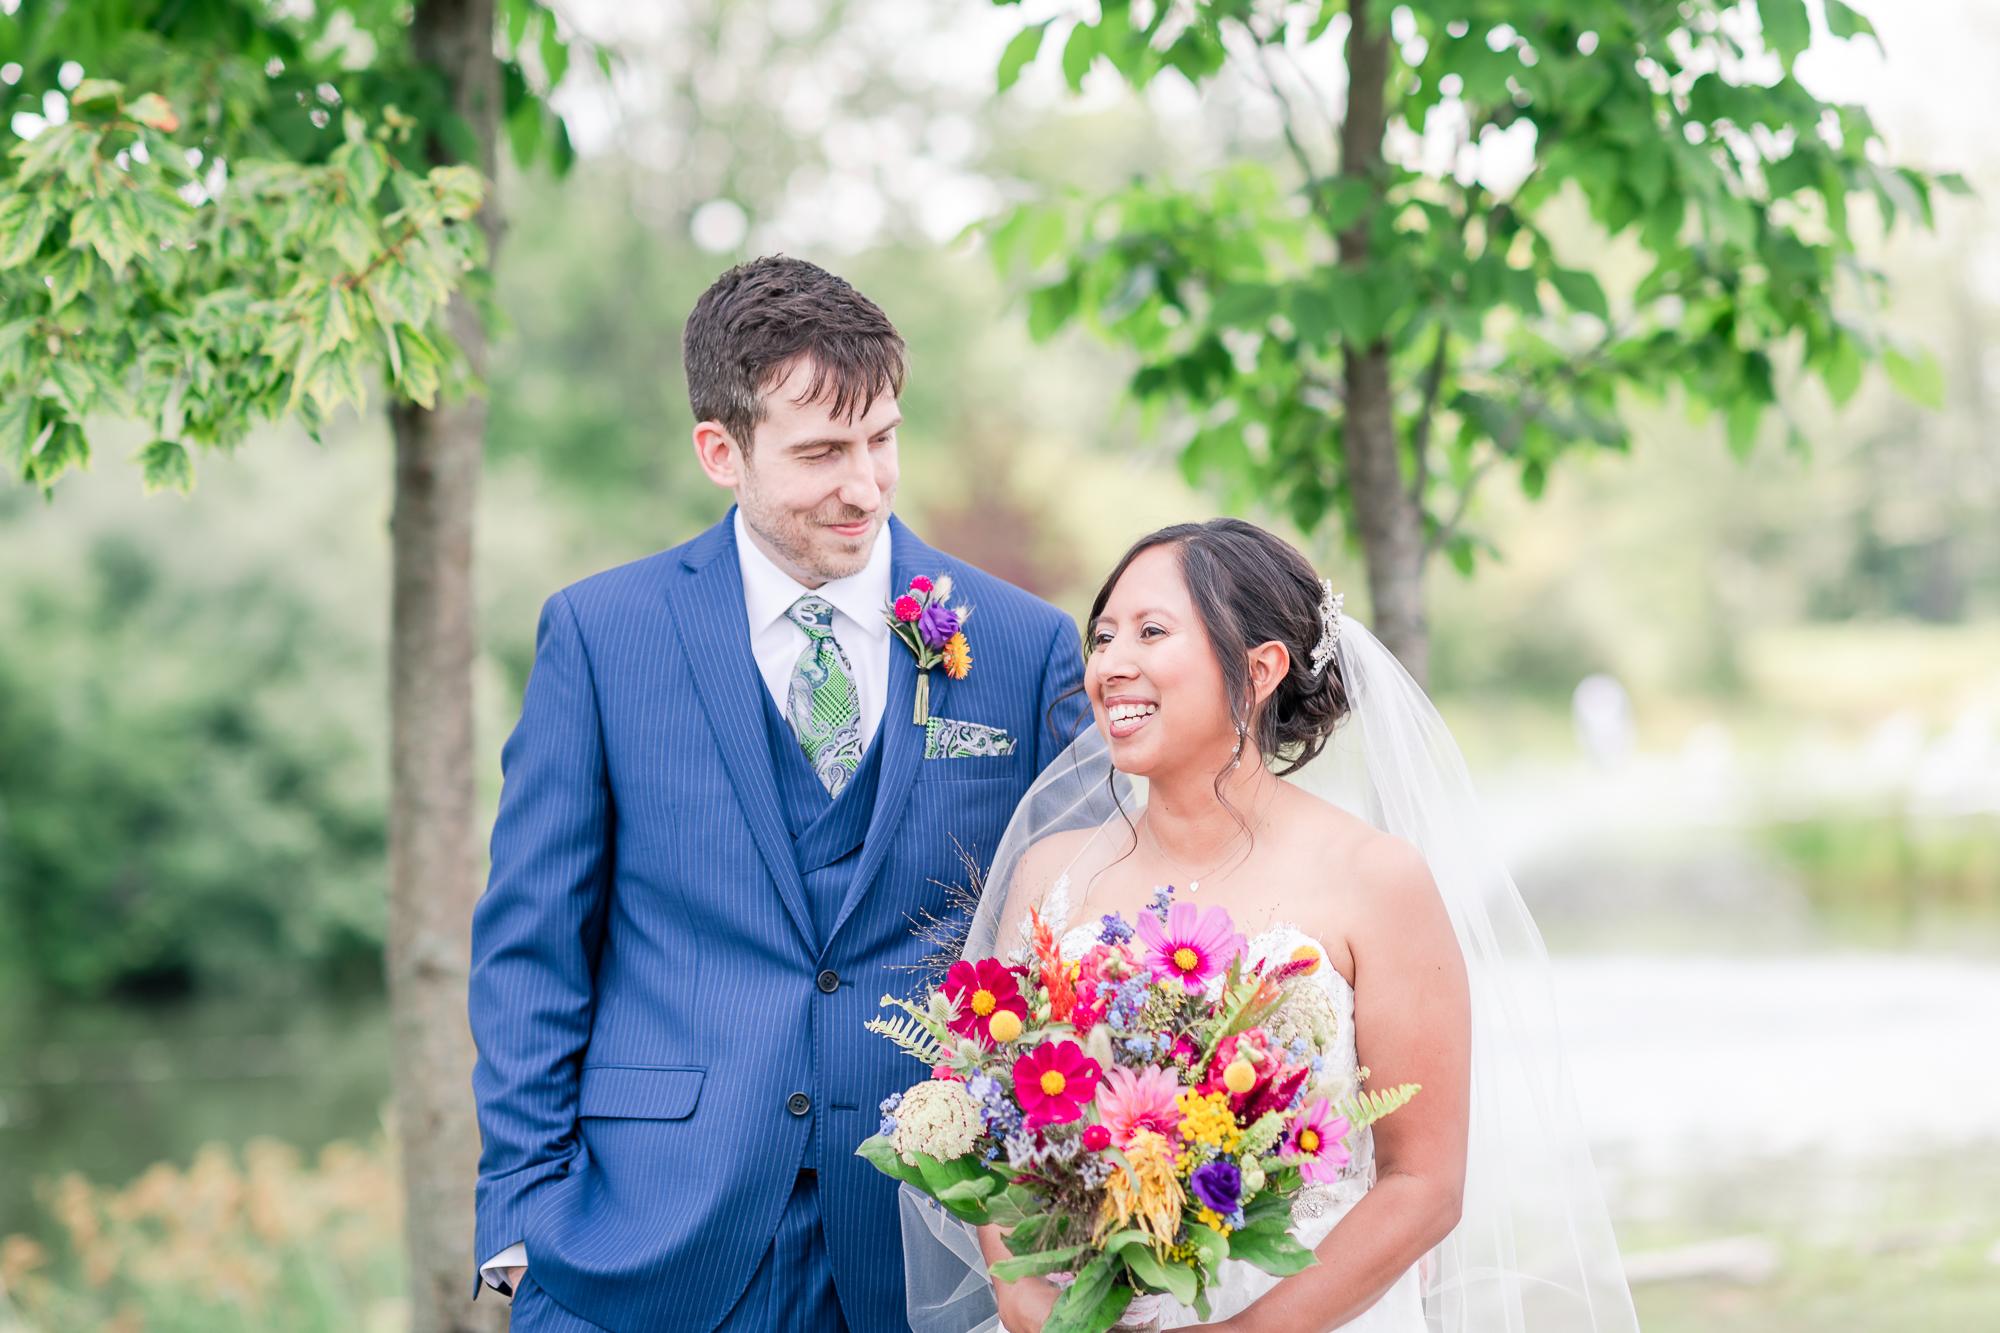 Maria+Adam_Summer Barn Wedding_The Barn and The North Star Preserve_Oberlin_Ohio-106.jpg